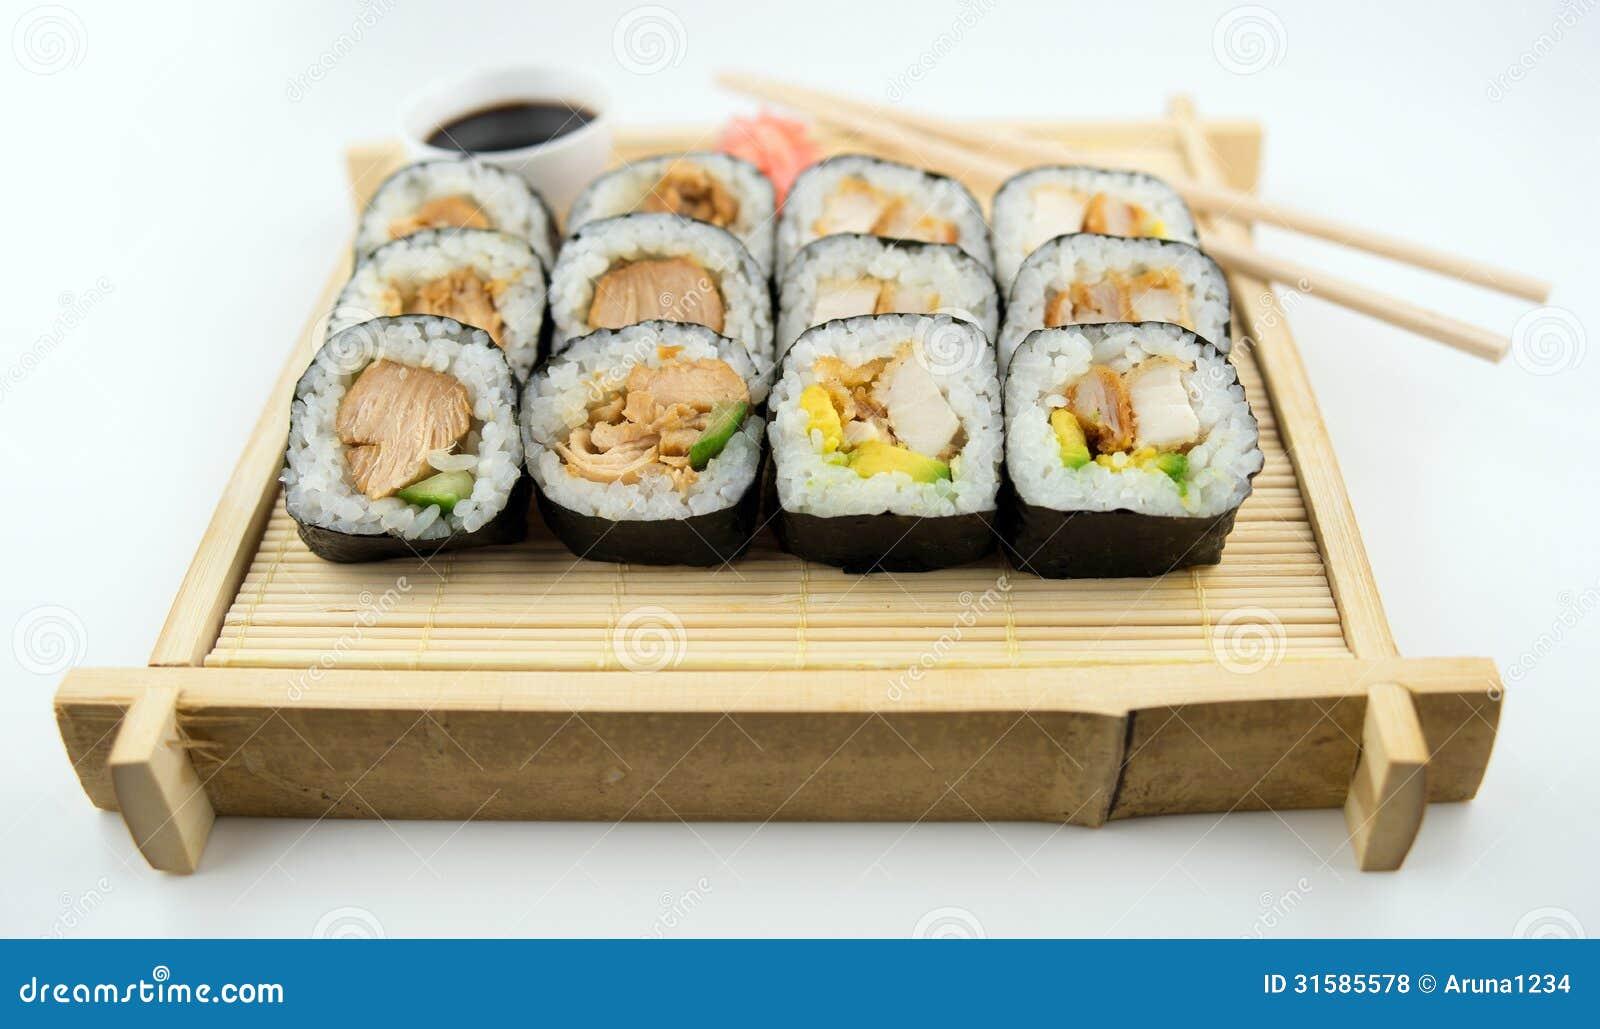 Teriyaki And Fried Chicken Sushi Rolls On Japanese Bamboo